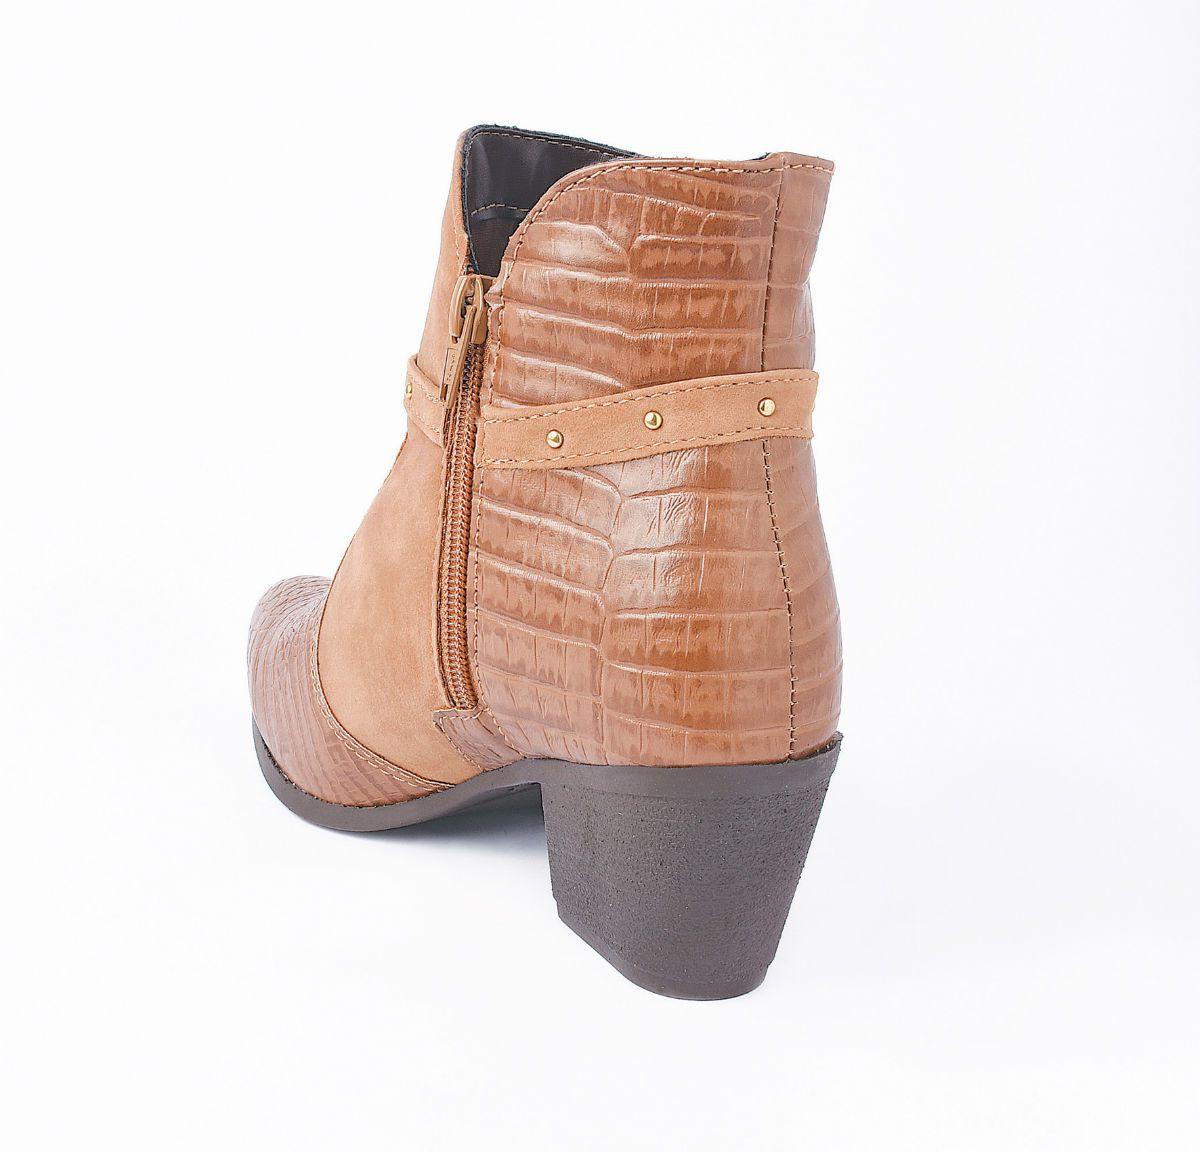 Bota Feminina Cano Curto Ankle Boot Caramelo Croco